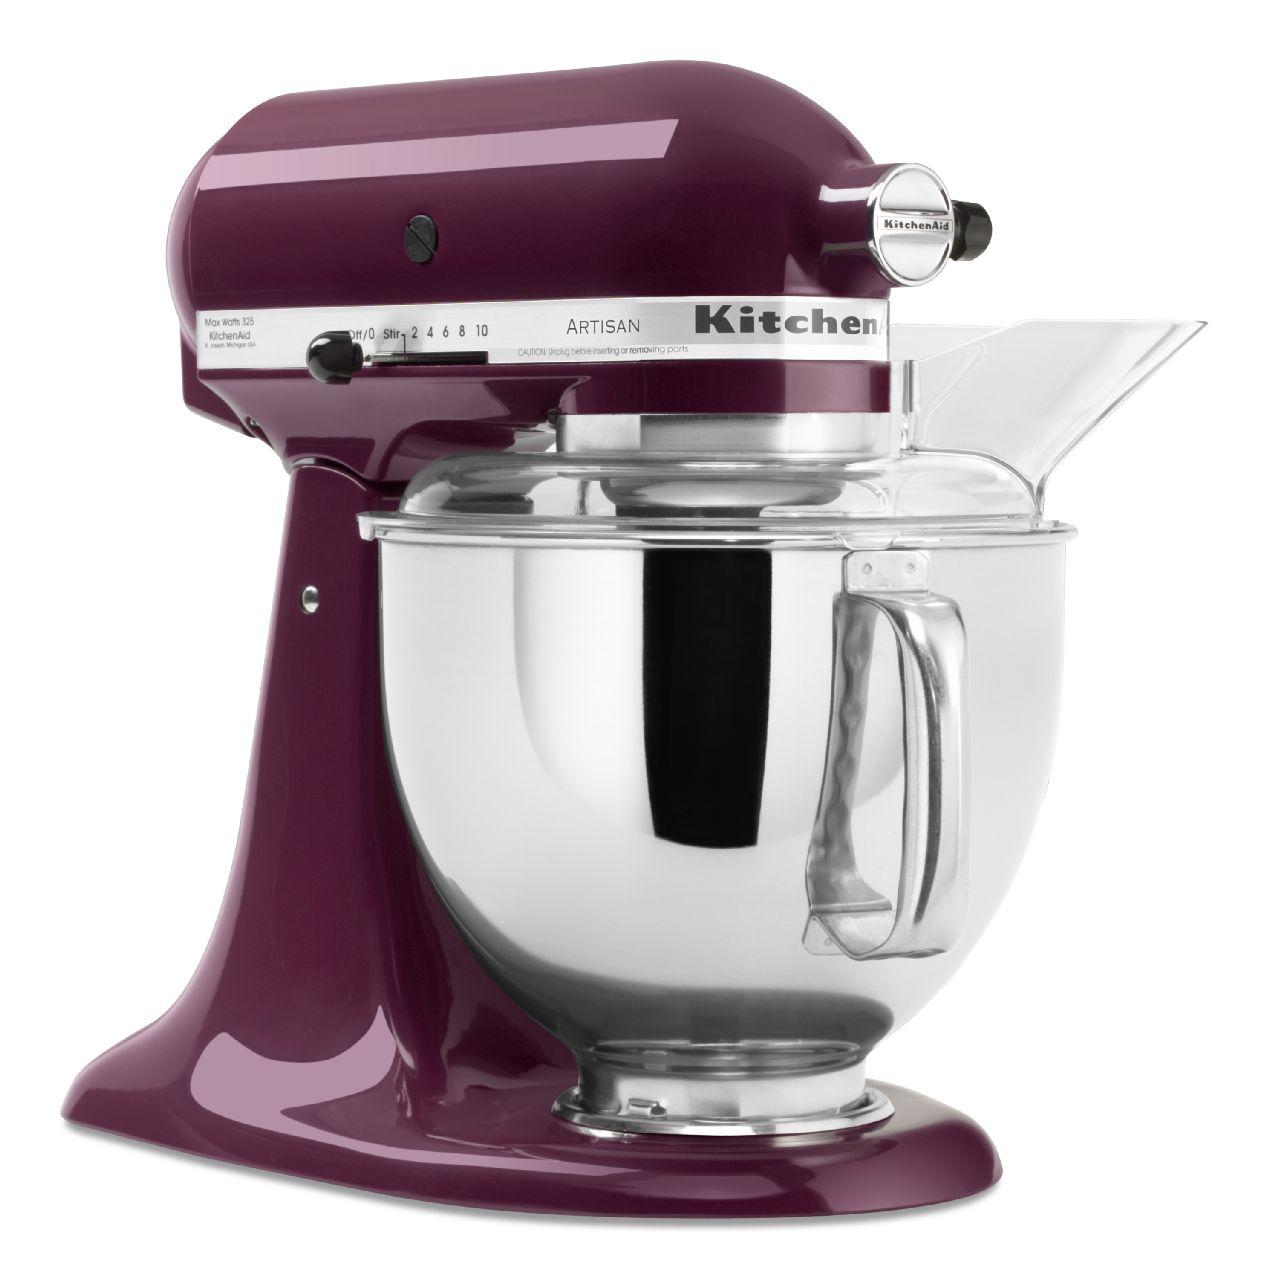 KitchenAid-Artisan-Series-5-Quart-Tilt-Head-Stand-Mixer-10-Speeds-KSM150PS thumbnail 30